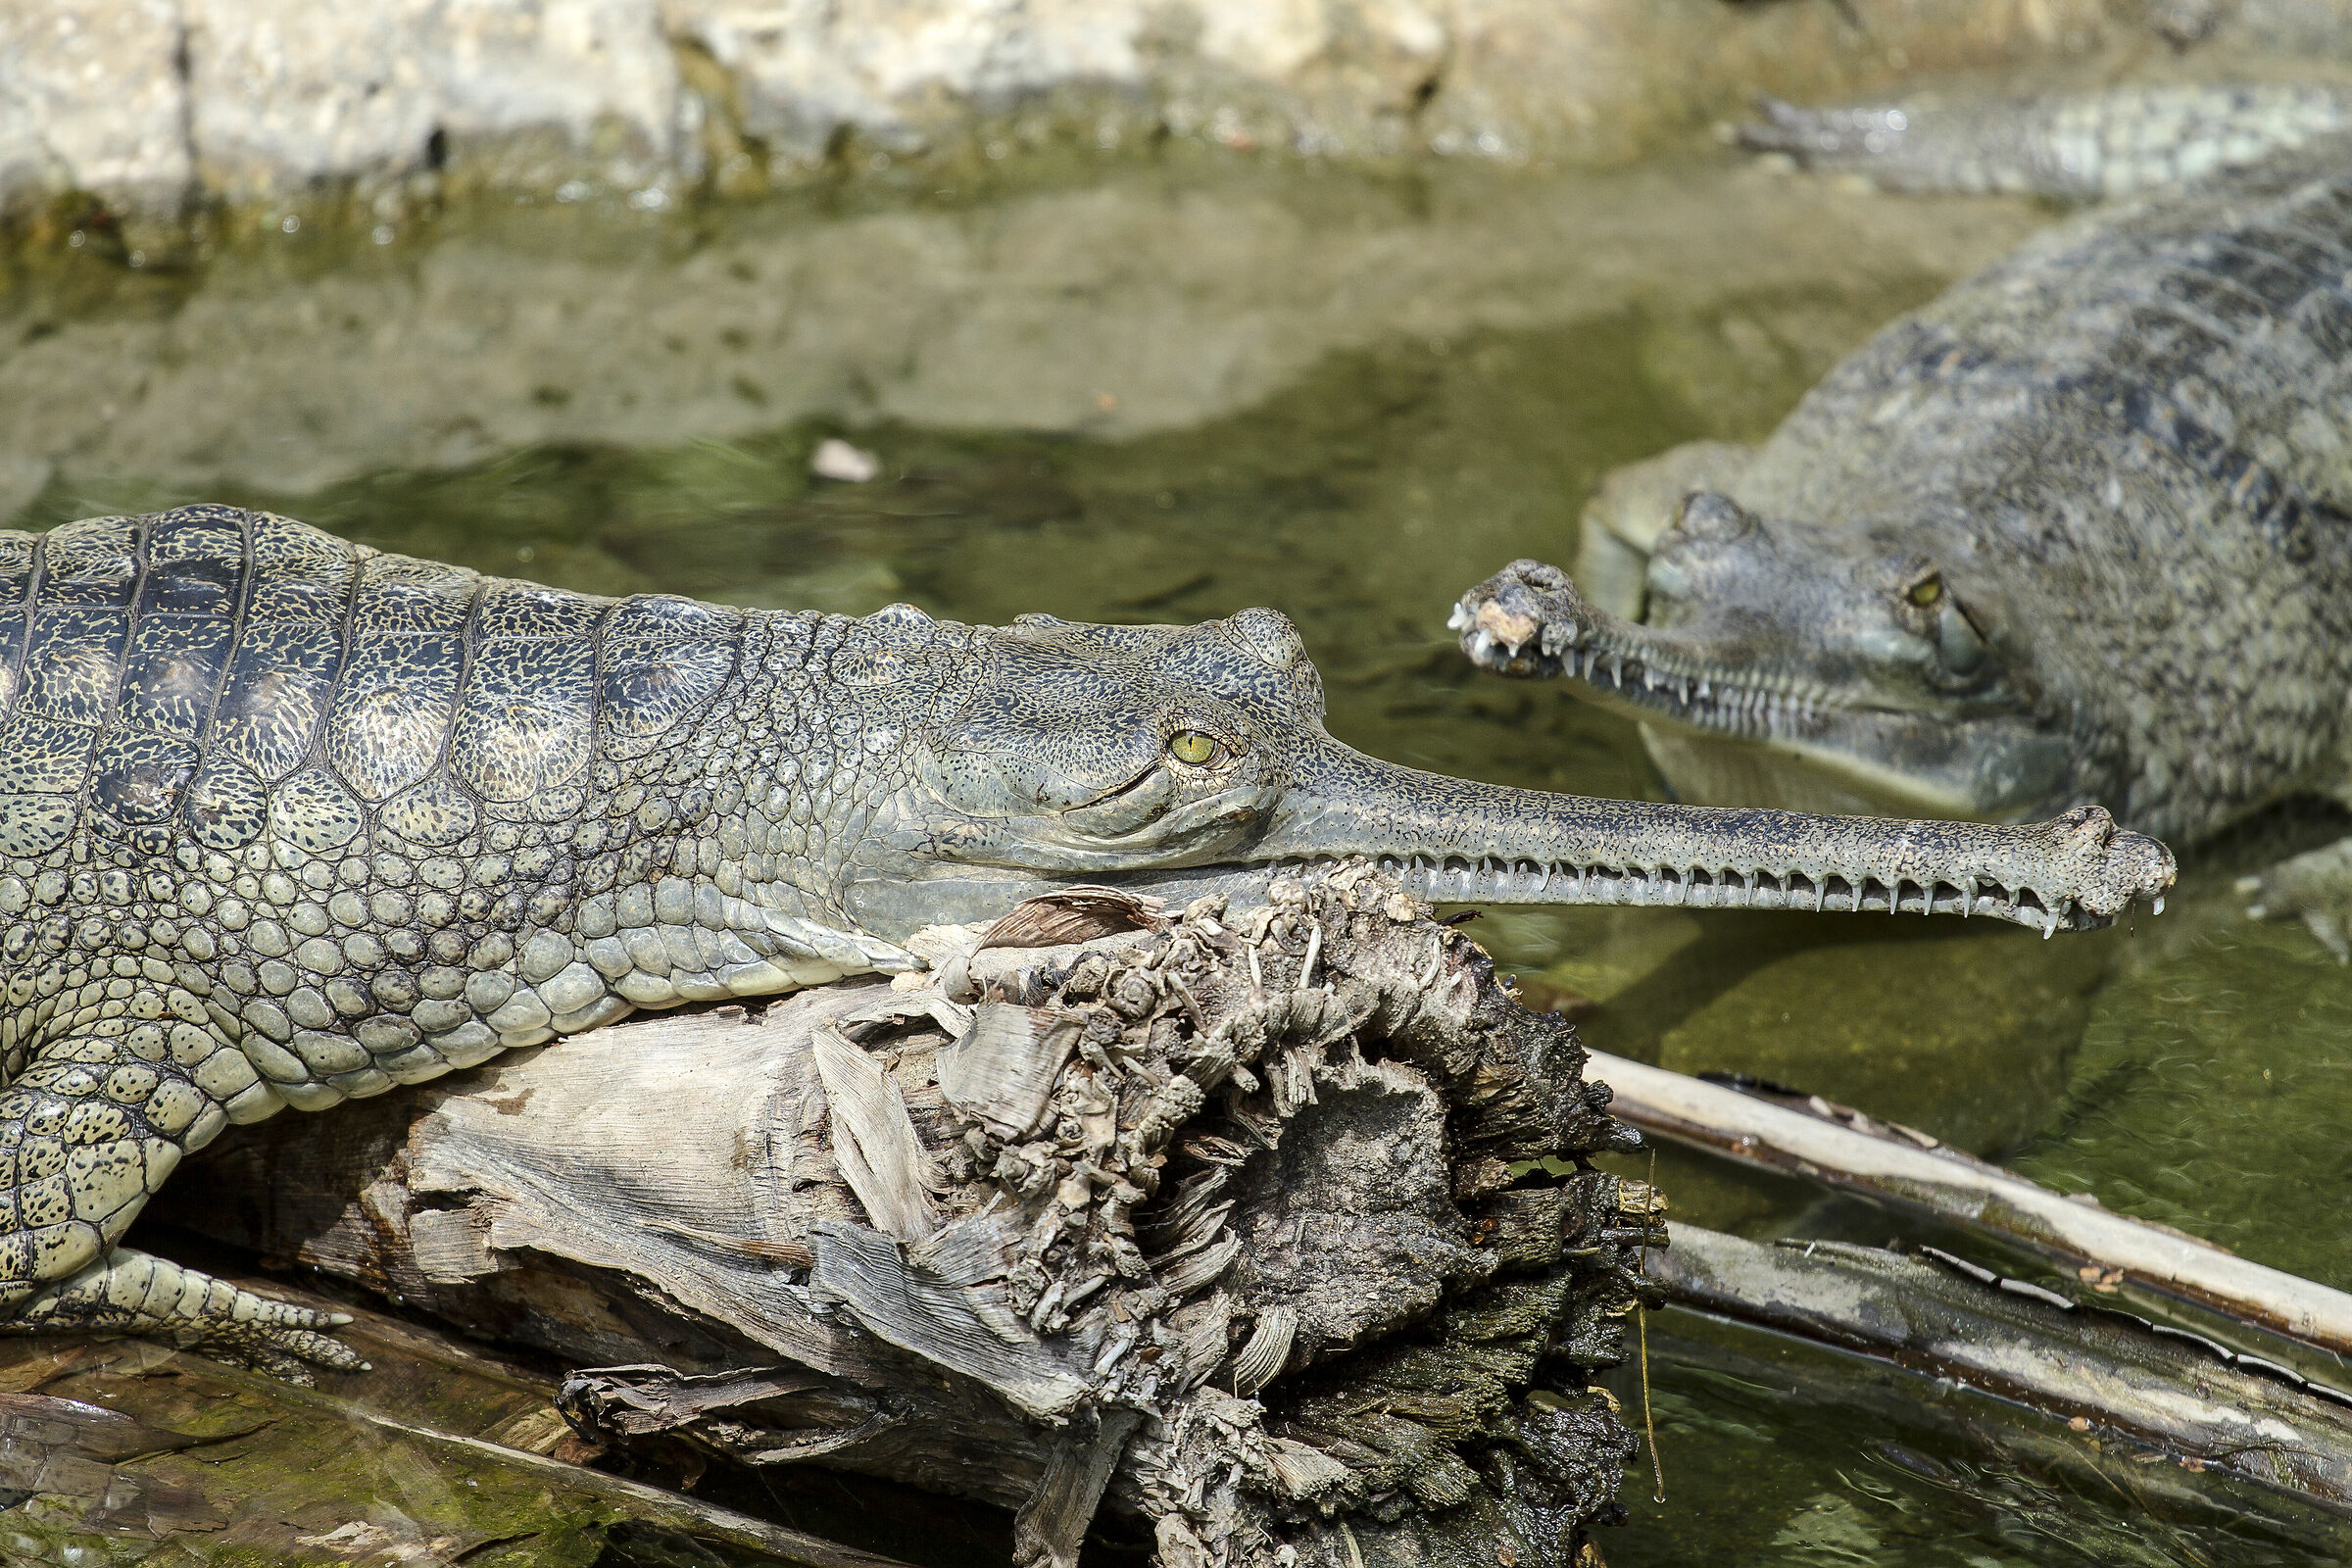 Slender-snouted Crocodile...